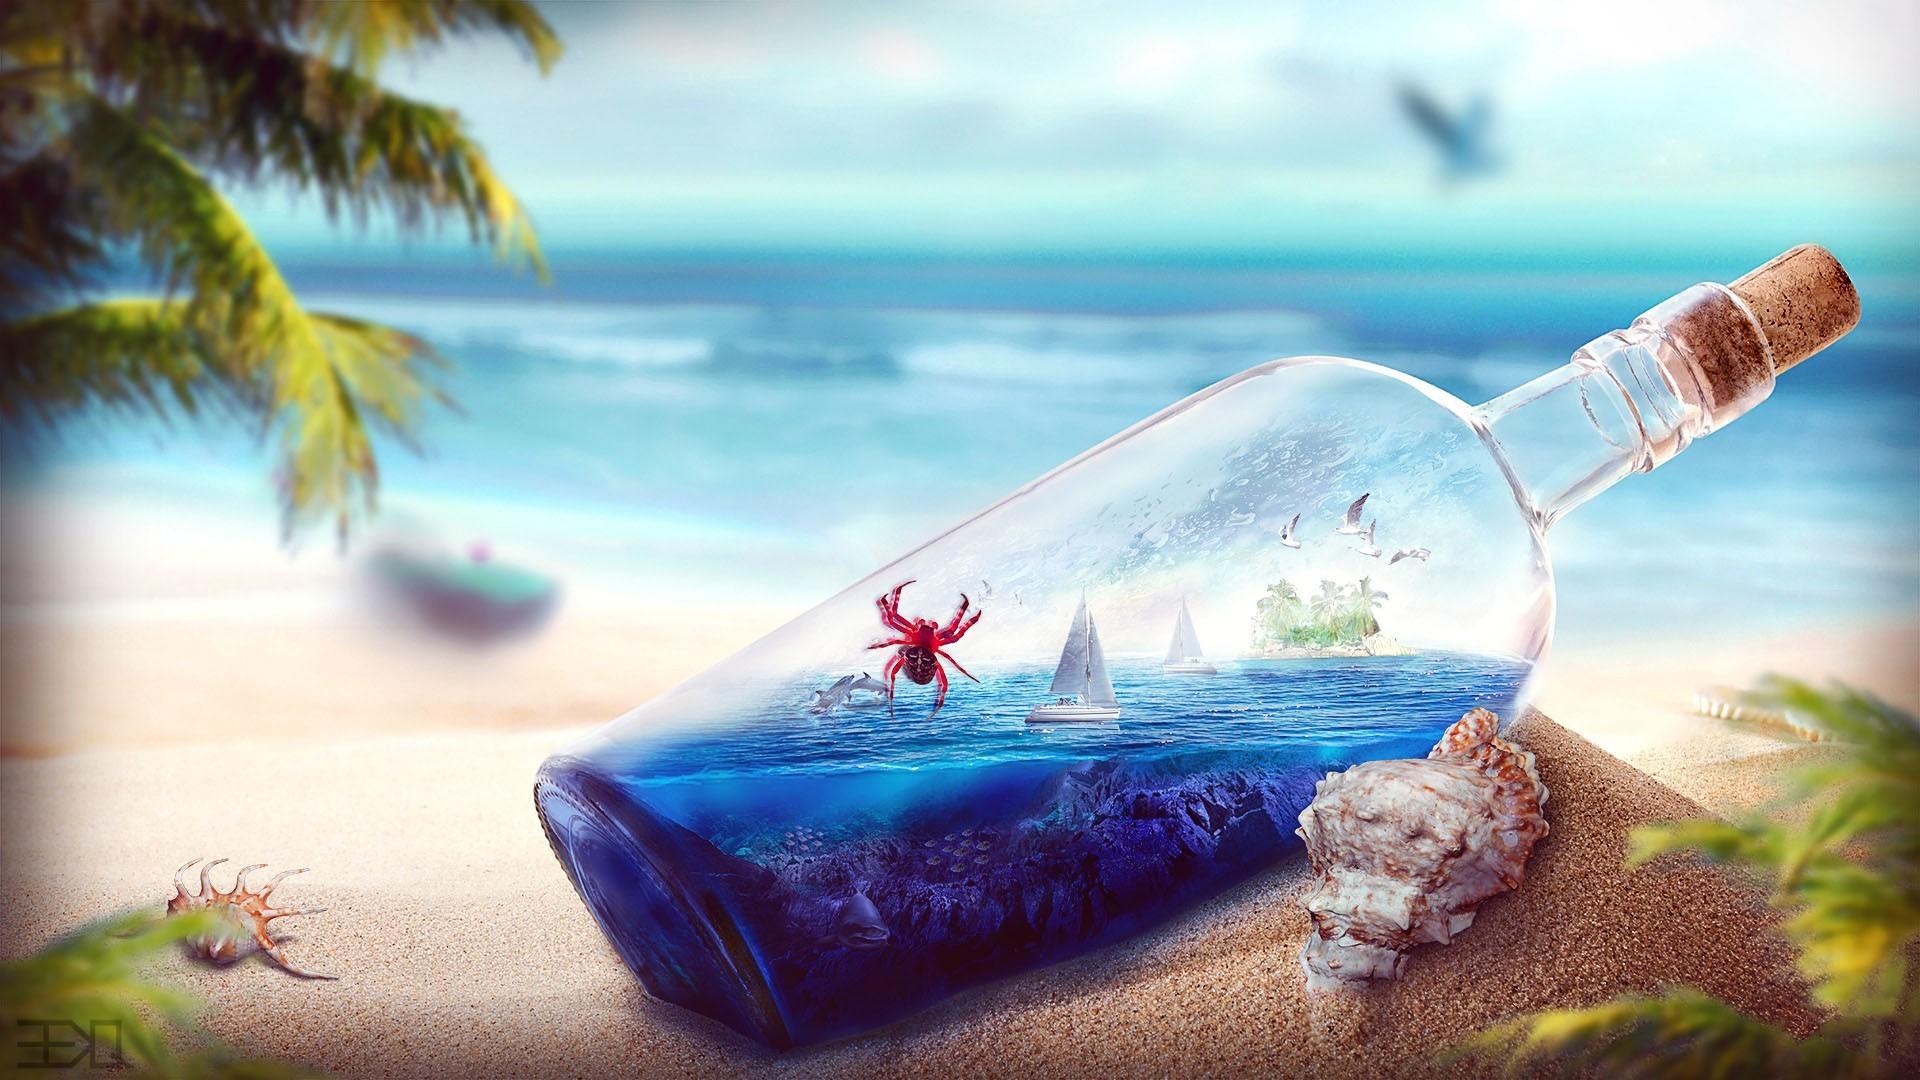 [66+] Cool Beach Wallpapers On WallpaperSafari